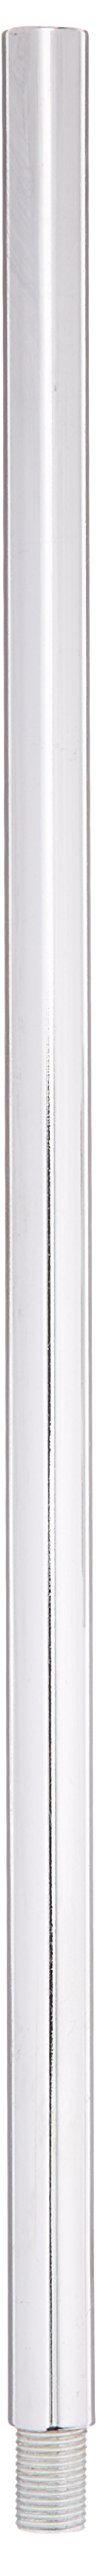 Maxim Lighting STR04512PC No Family Extension Rod, Polished Chrome by Maxim Lighting